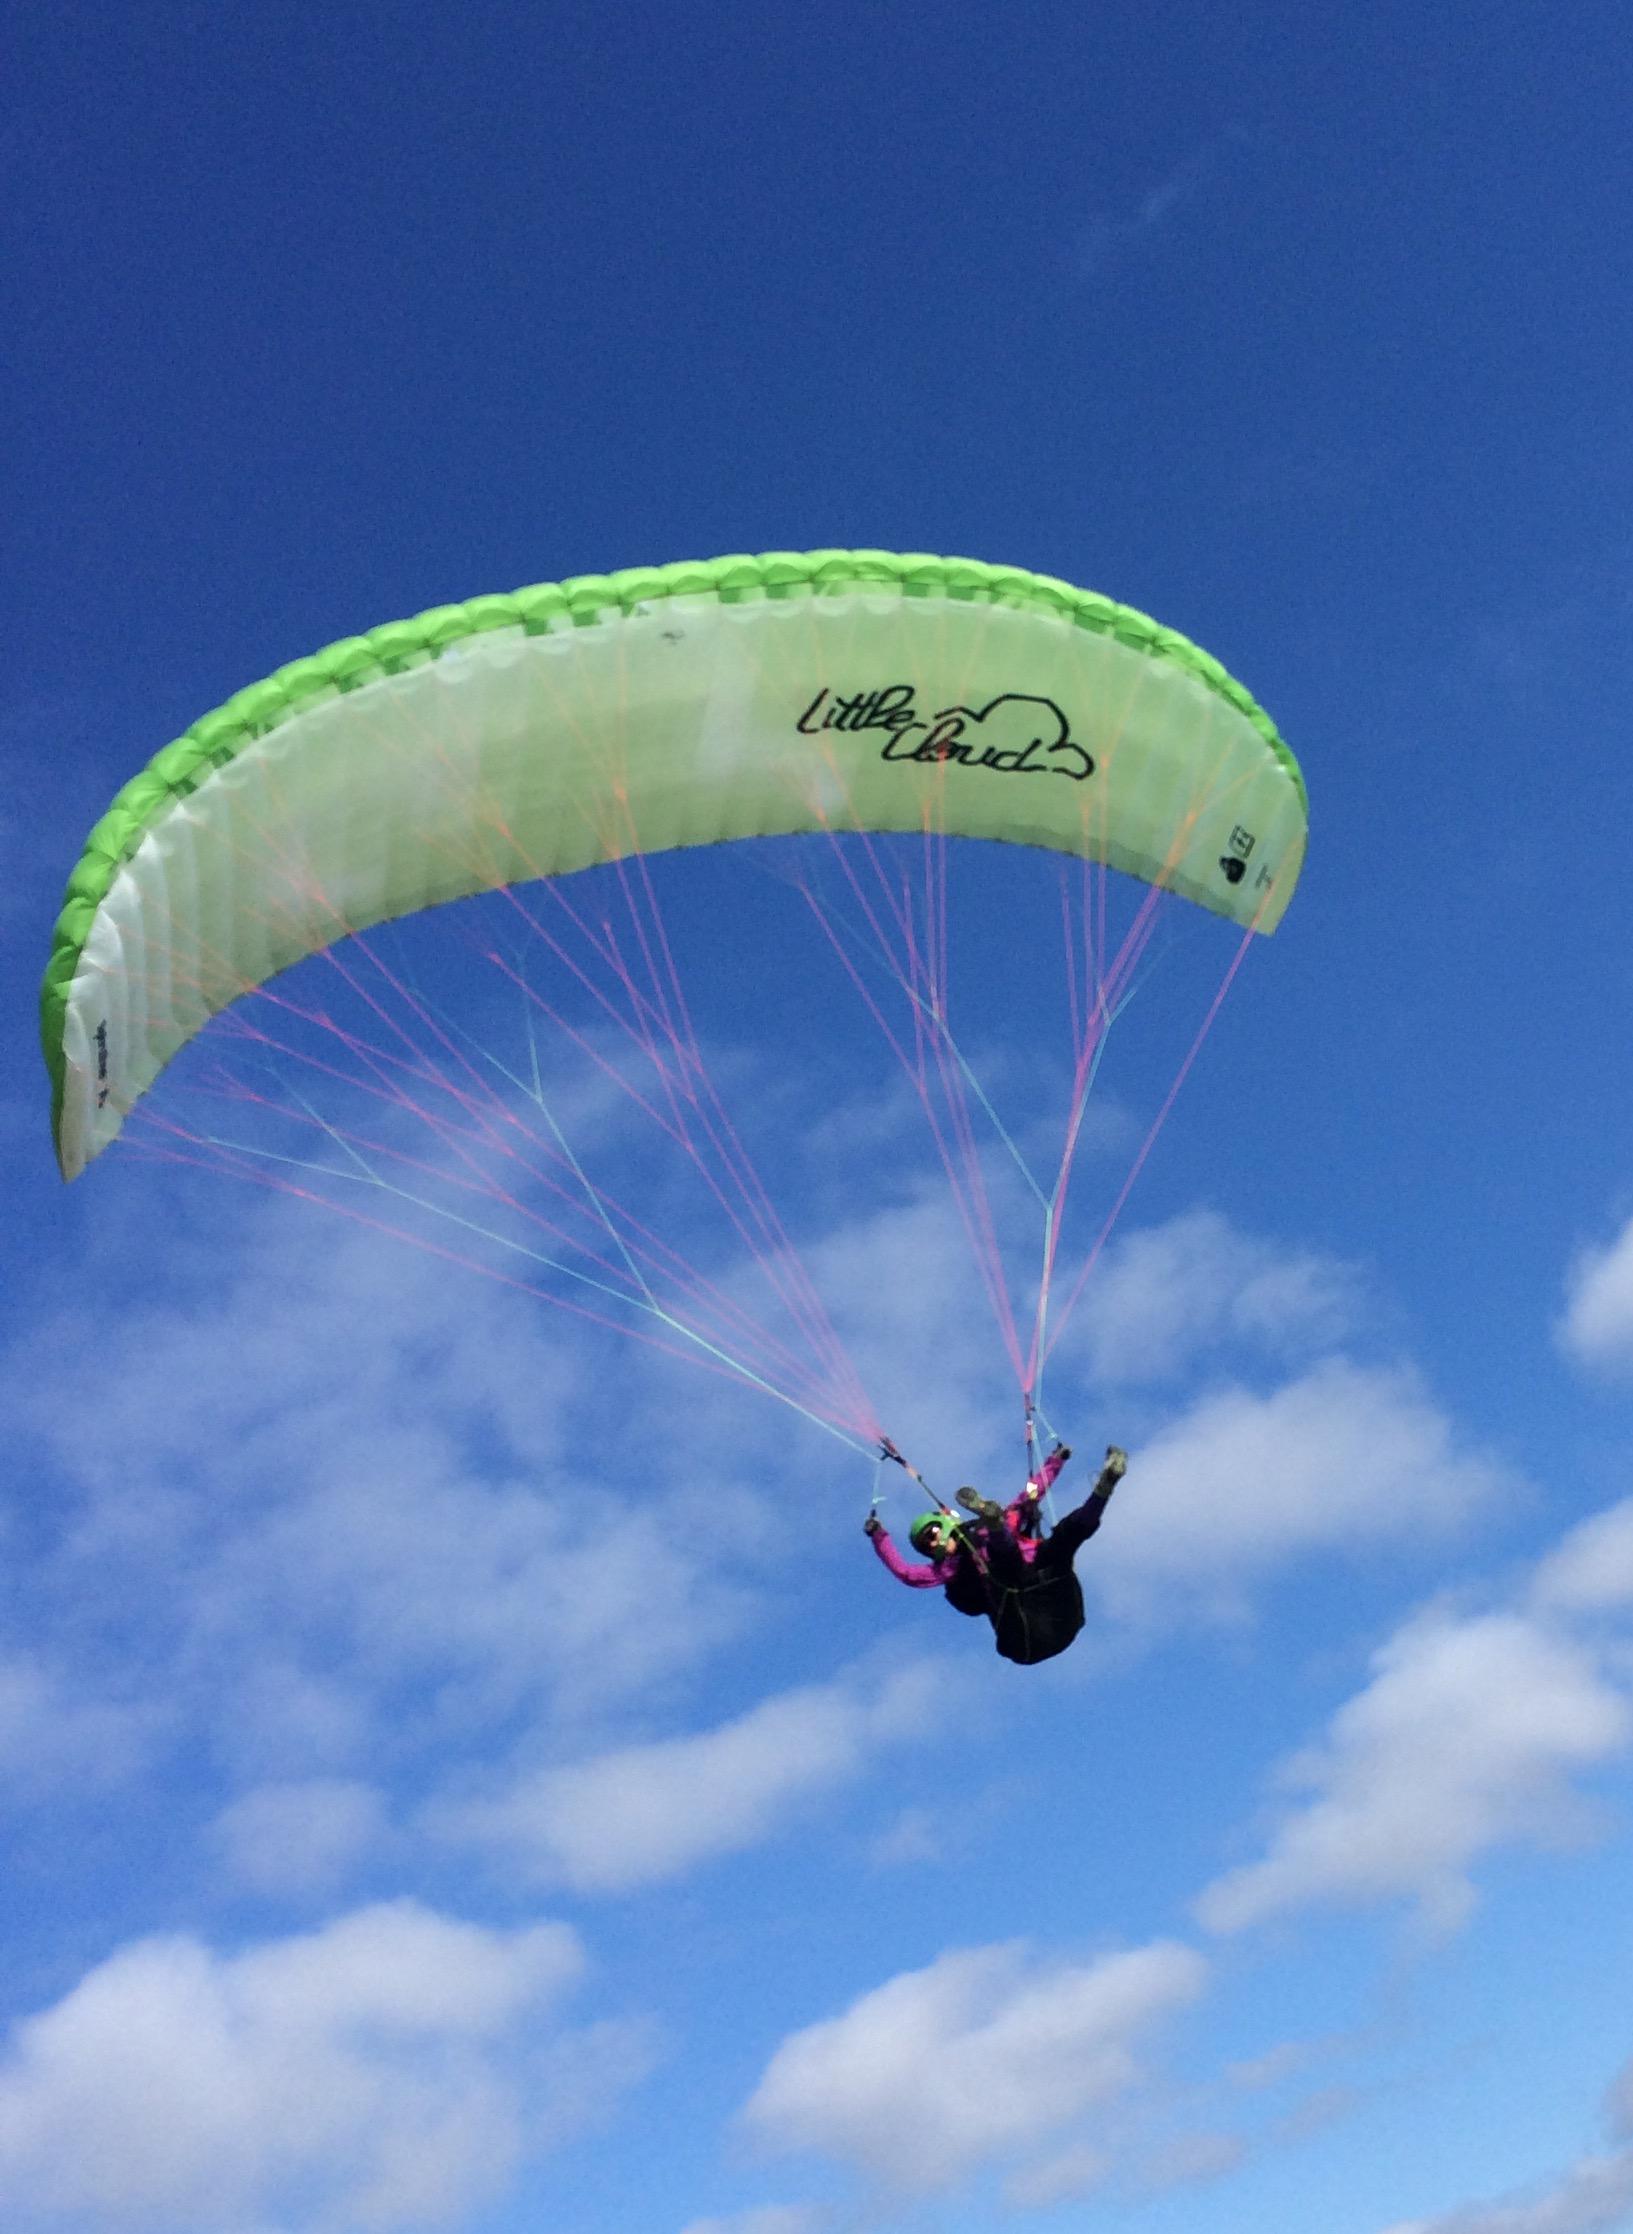 LeslieBird enjoying her soaring session